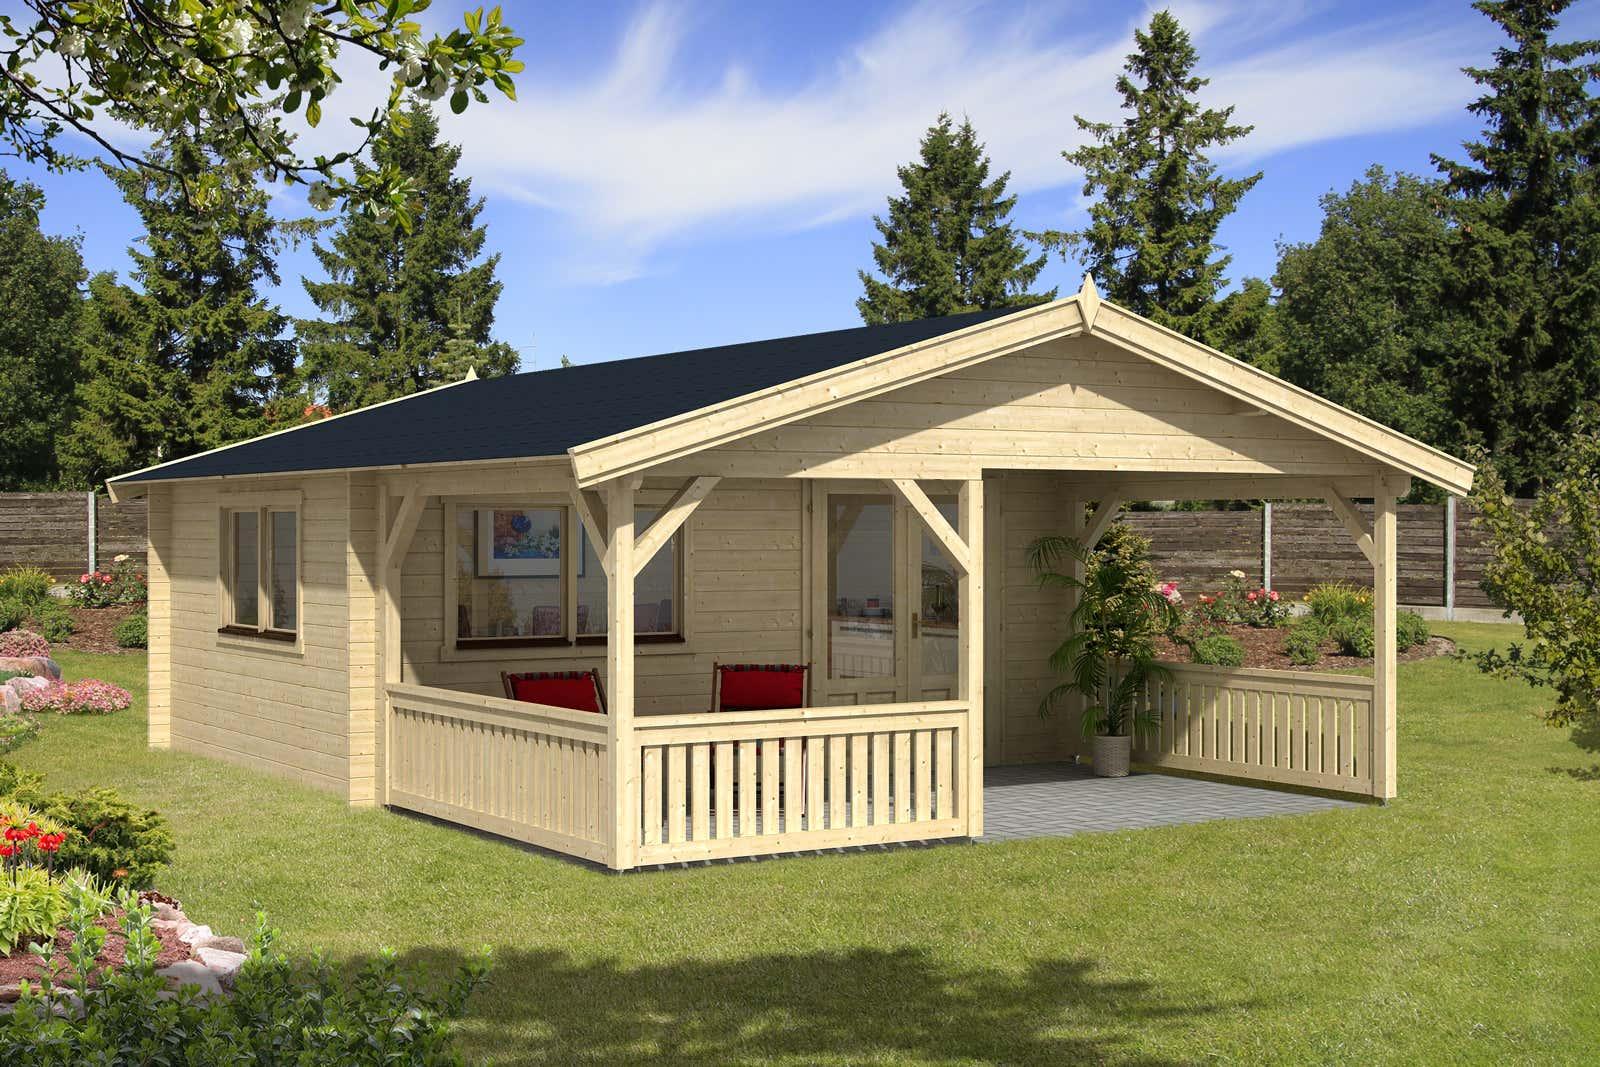 gartenhaus modell flex 50 d mit 300cm terrasse 5x4 3 a z. Black Bedroom Furniture Sets. Home Design Ideas